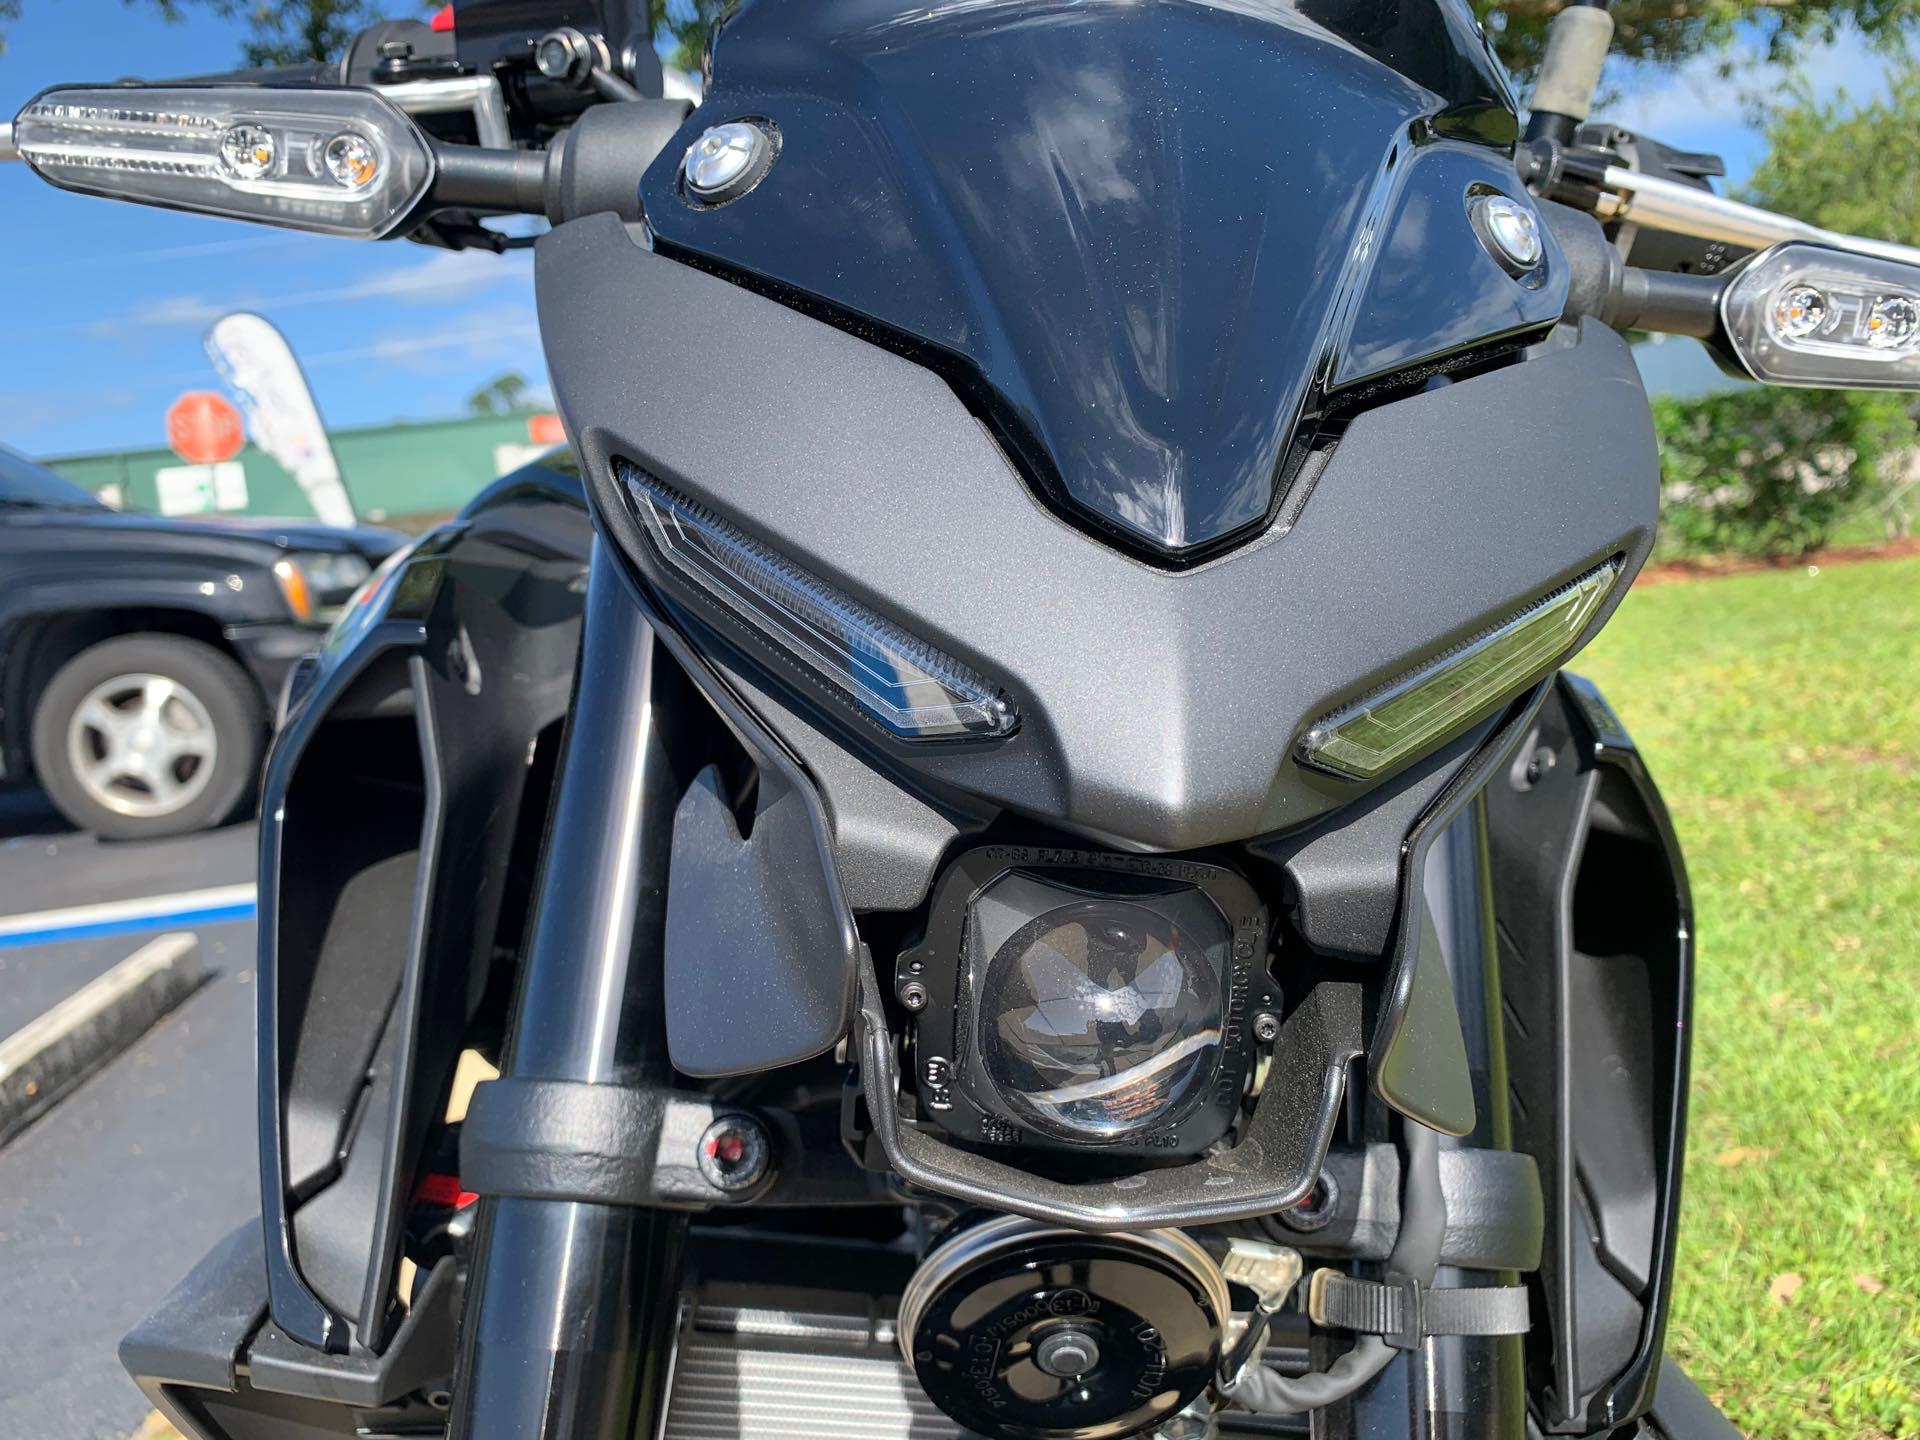 2020 Yamaha MT03LB 03 at Powersports St. Augustine